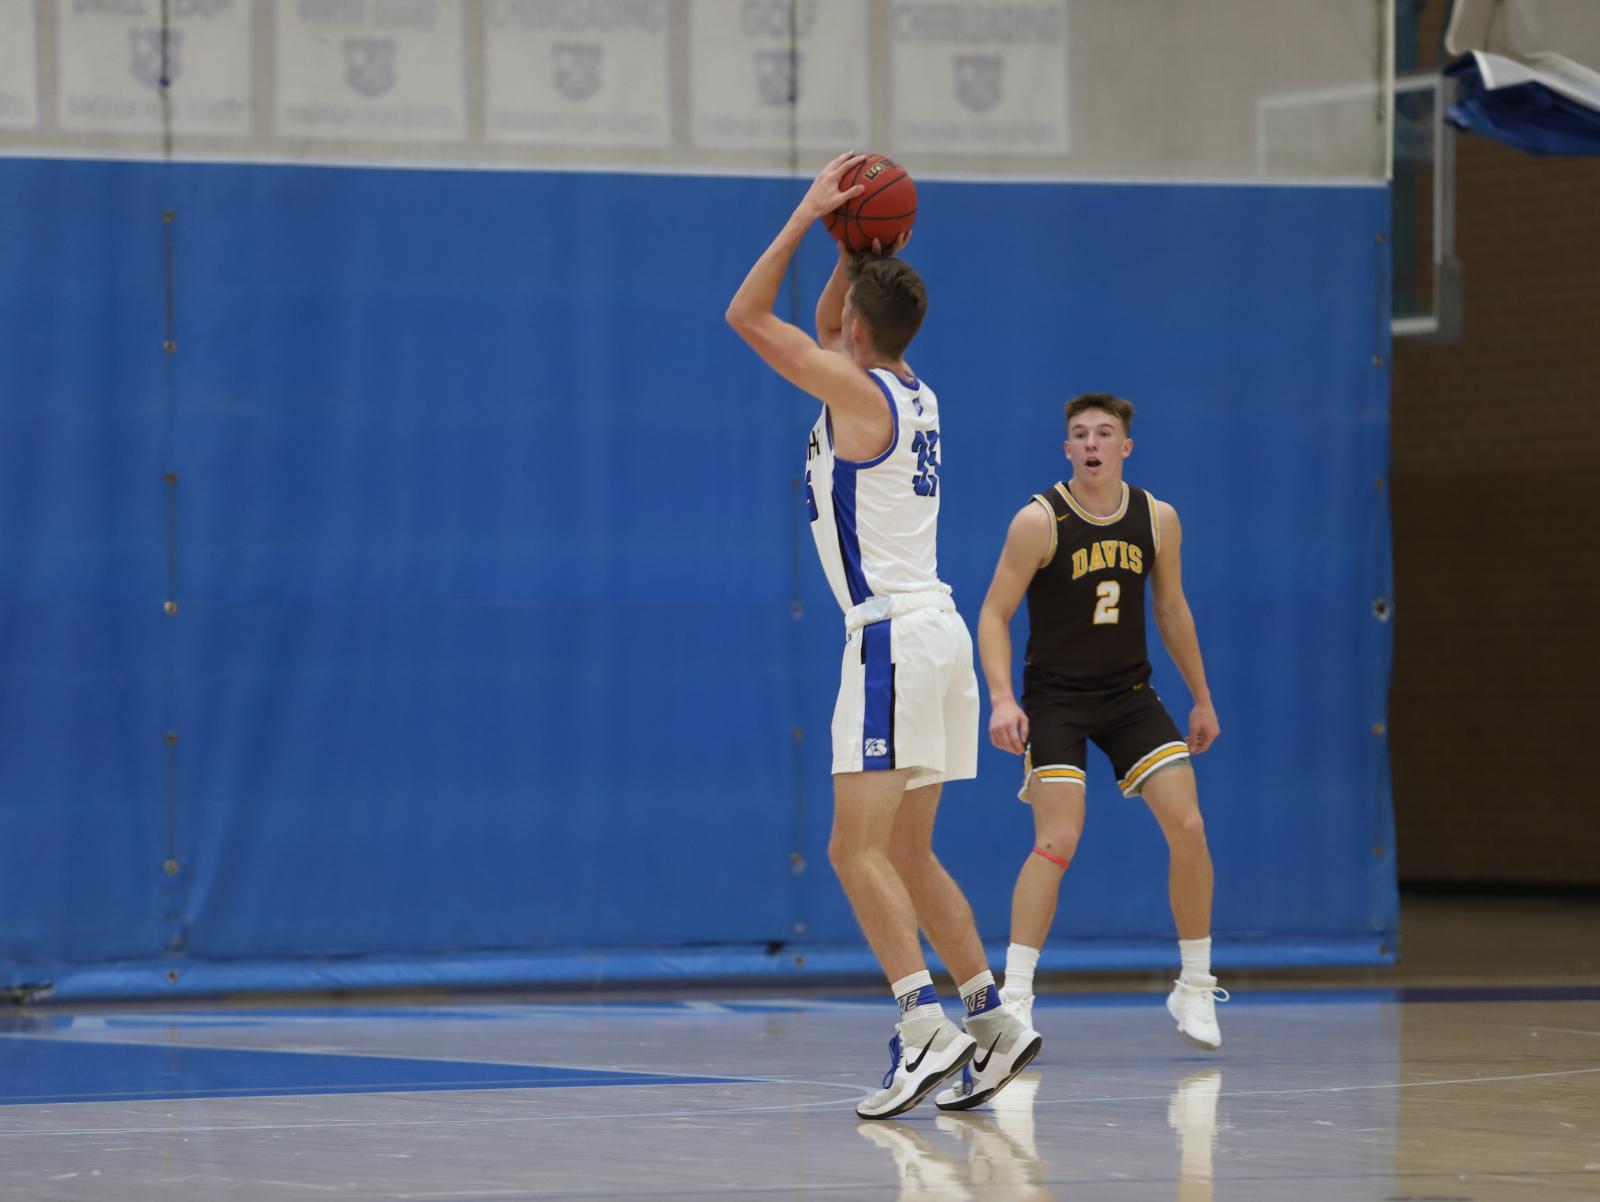 Boys Basketball vs. Davis HS Pics